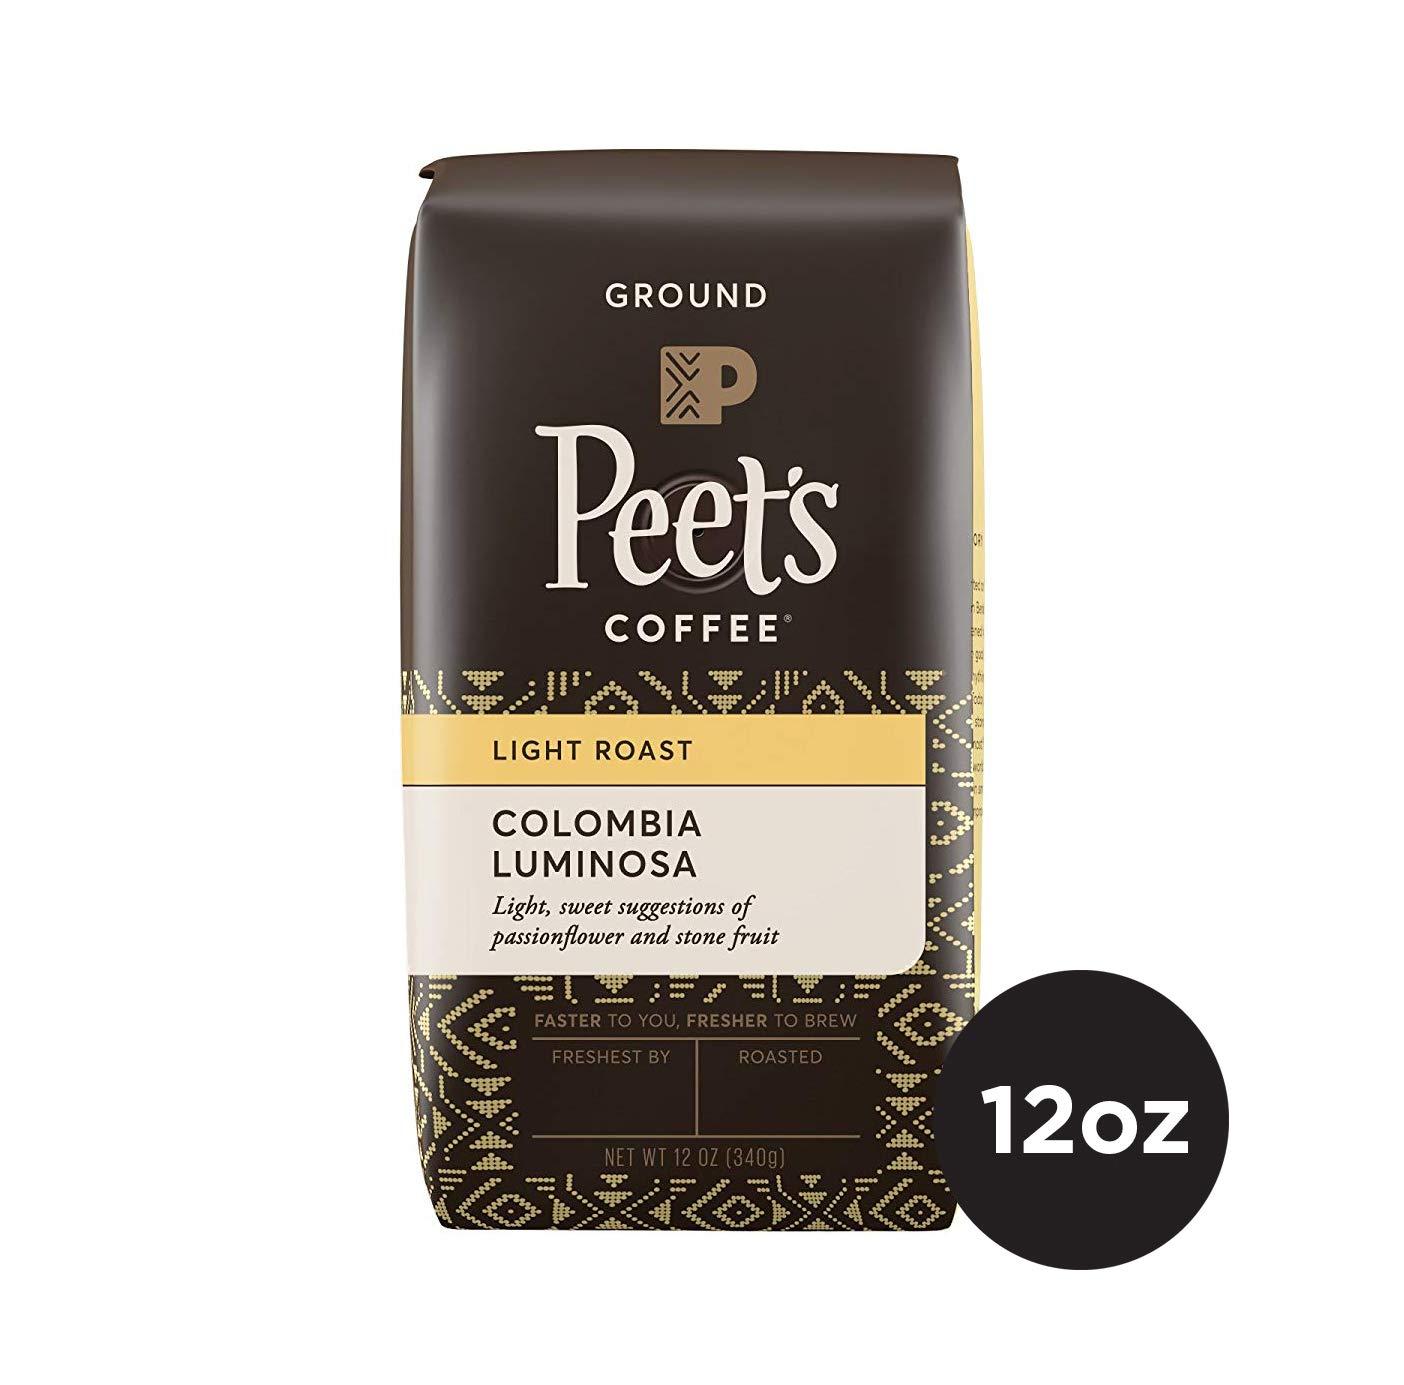 Peet's Light Roast Coffee Review